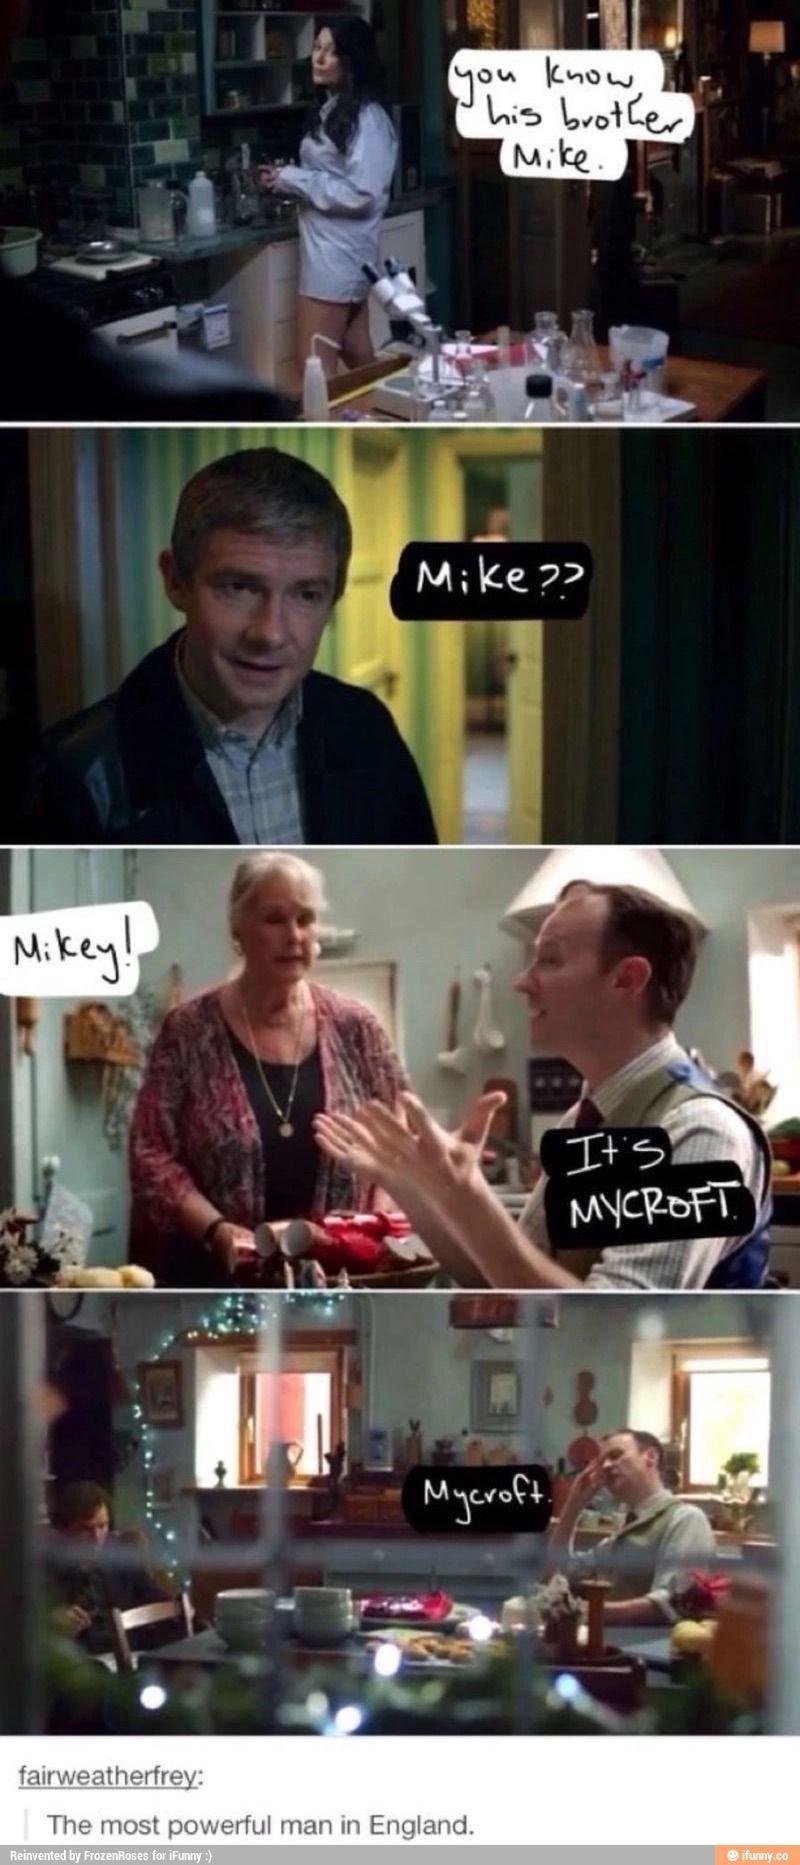 Sherlock, bbcsherlock, Mycroft Sherlock holmes, Sherlock